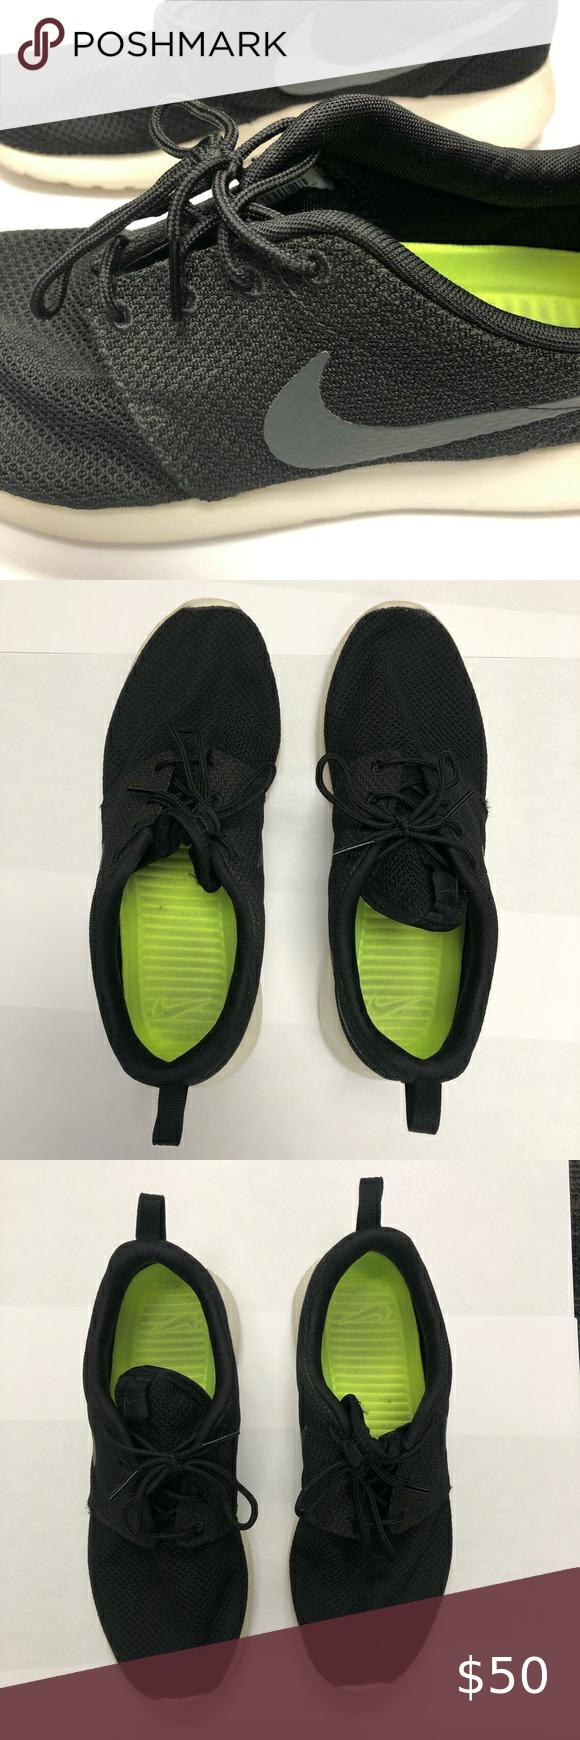 Men's 9 Black mesh upper Nike trainers